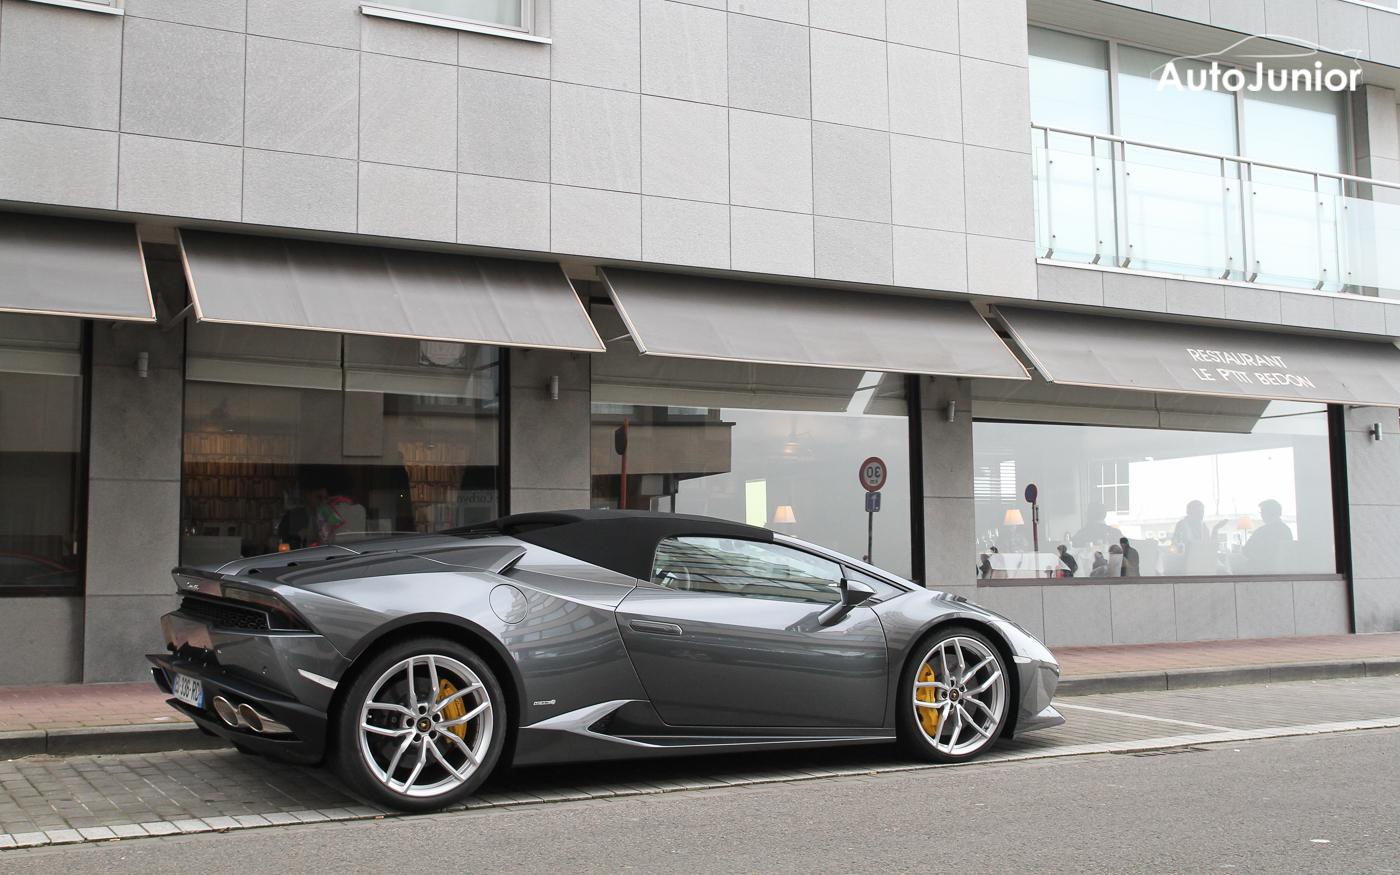 Gespot: 2x Lamborghini Huracán Spyder